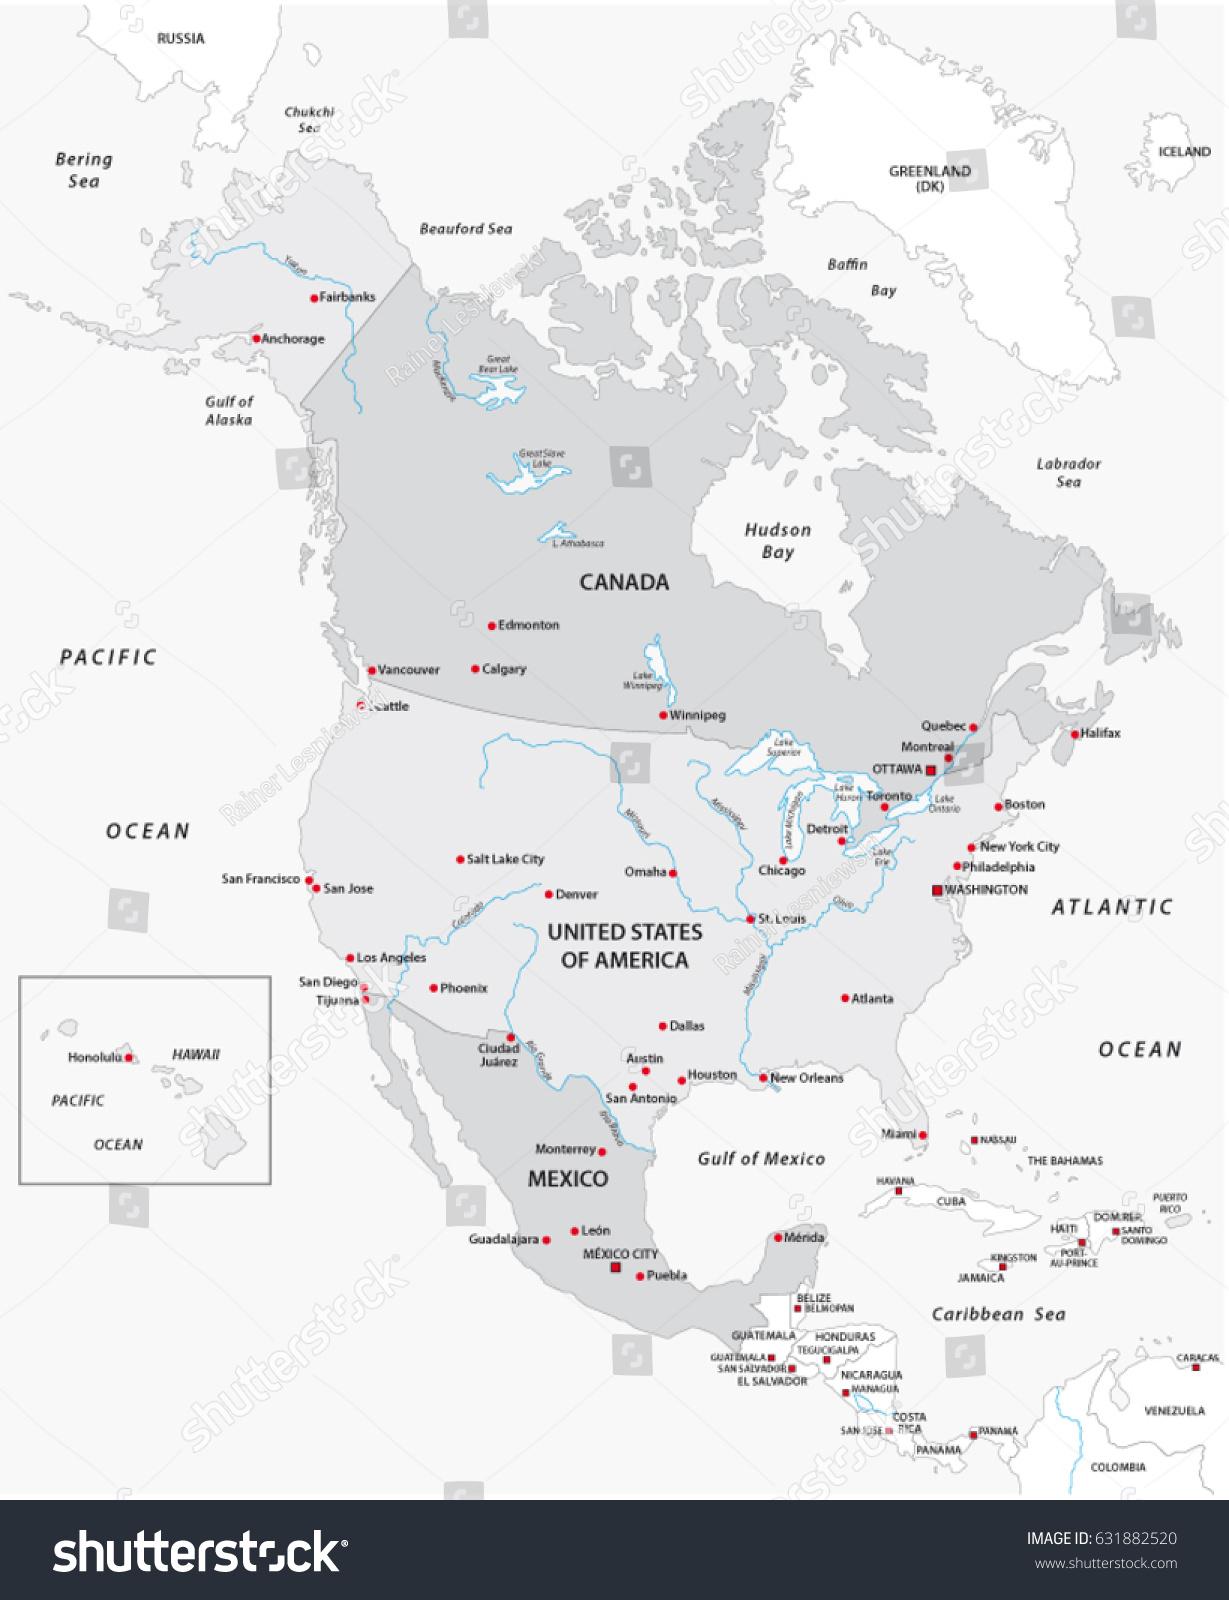 imageshutterstockcomzstock vector map of north